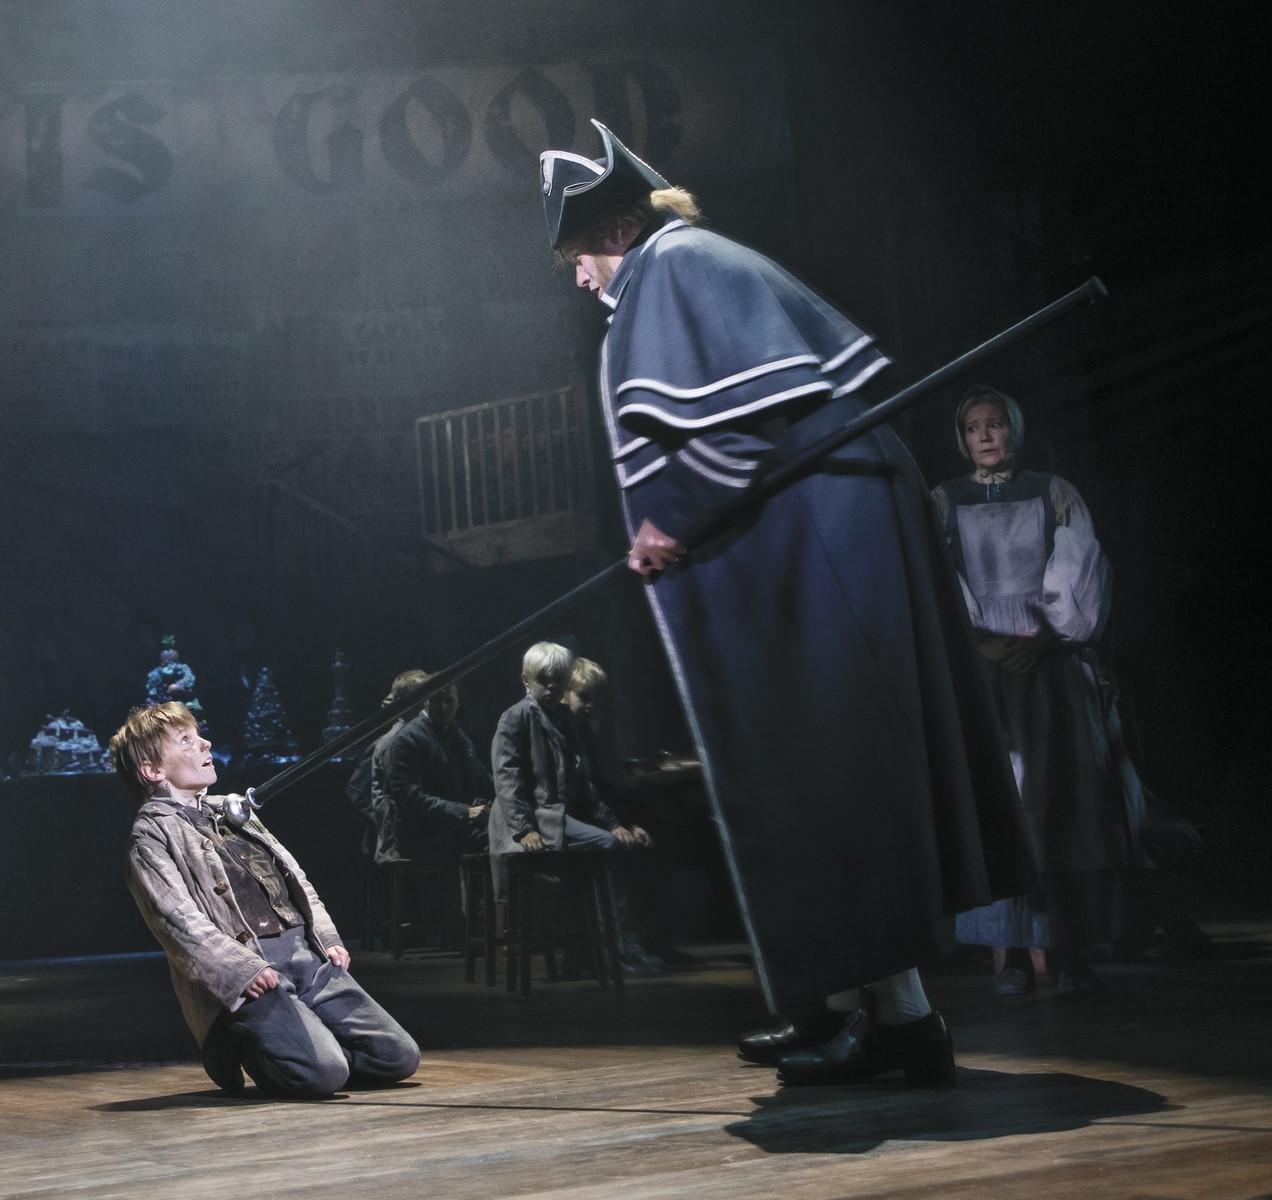 Anmeldelse: Oliver!, Det Ny Teater